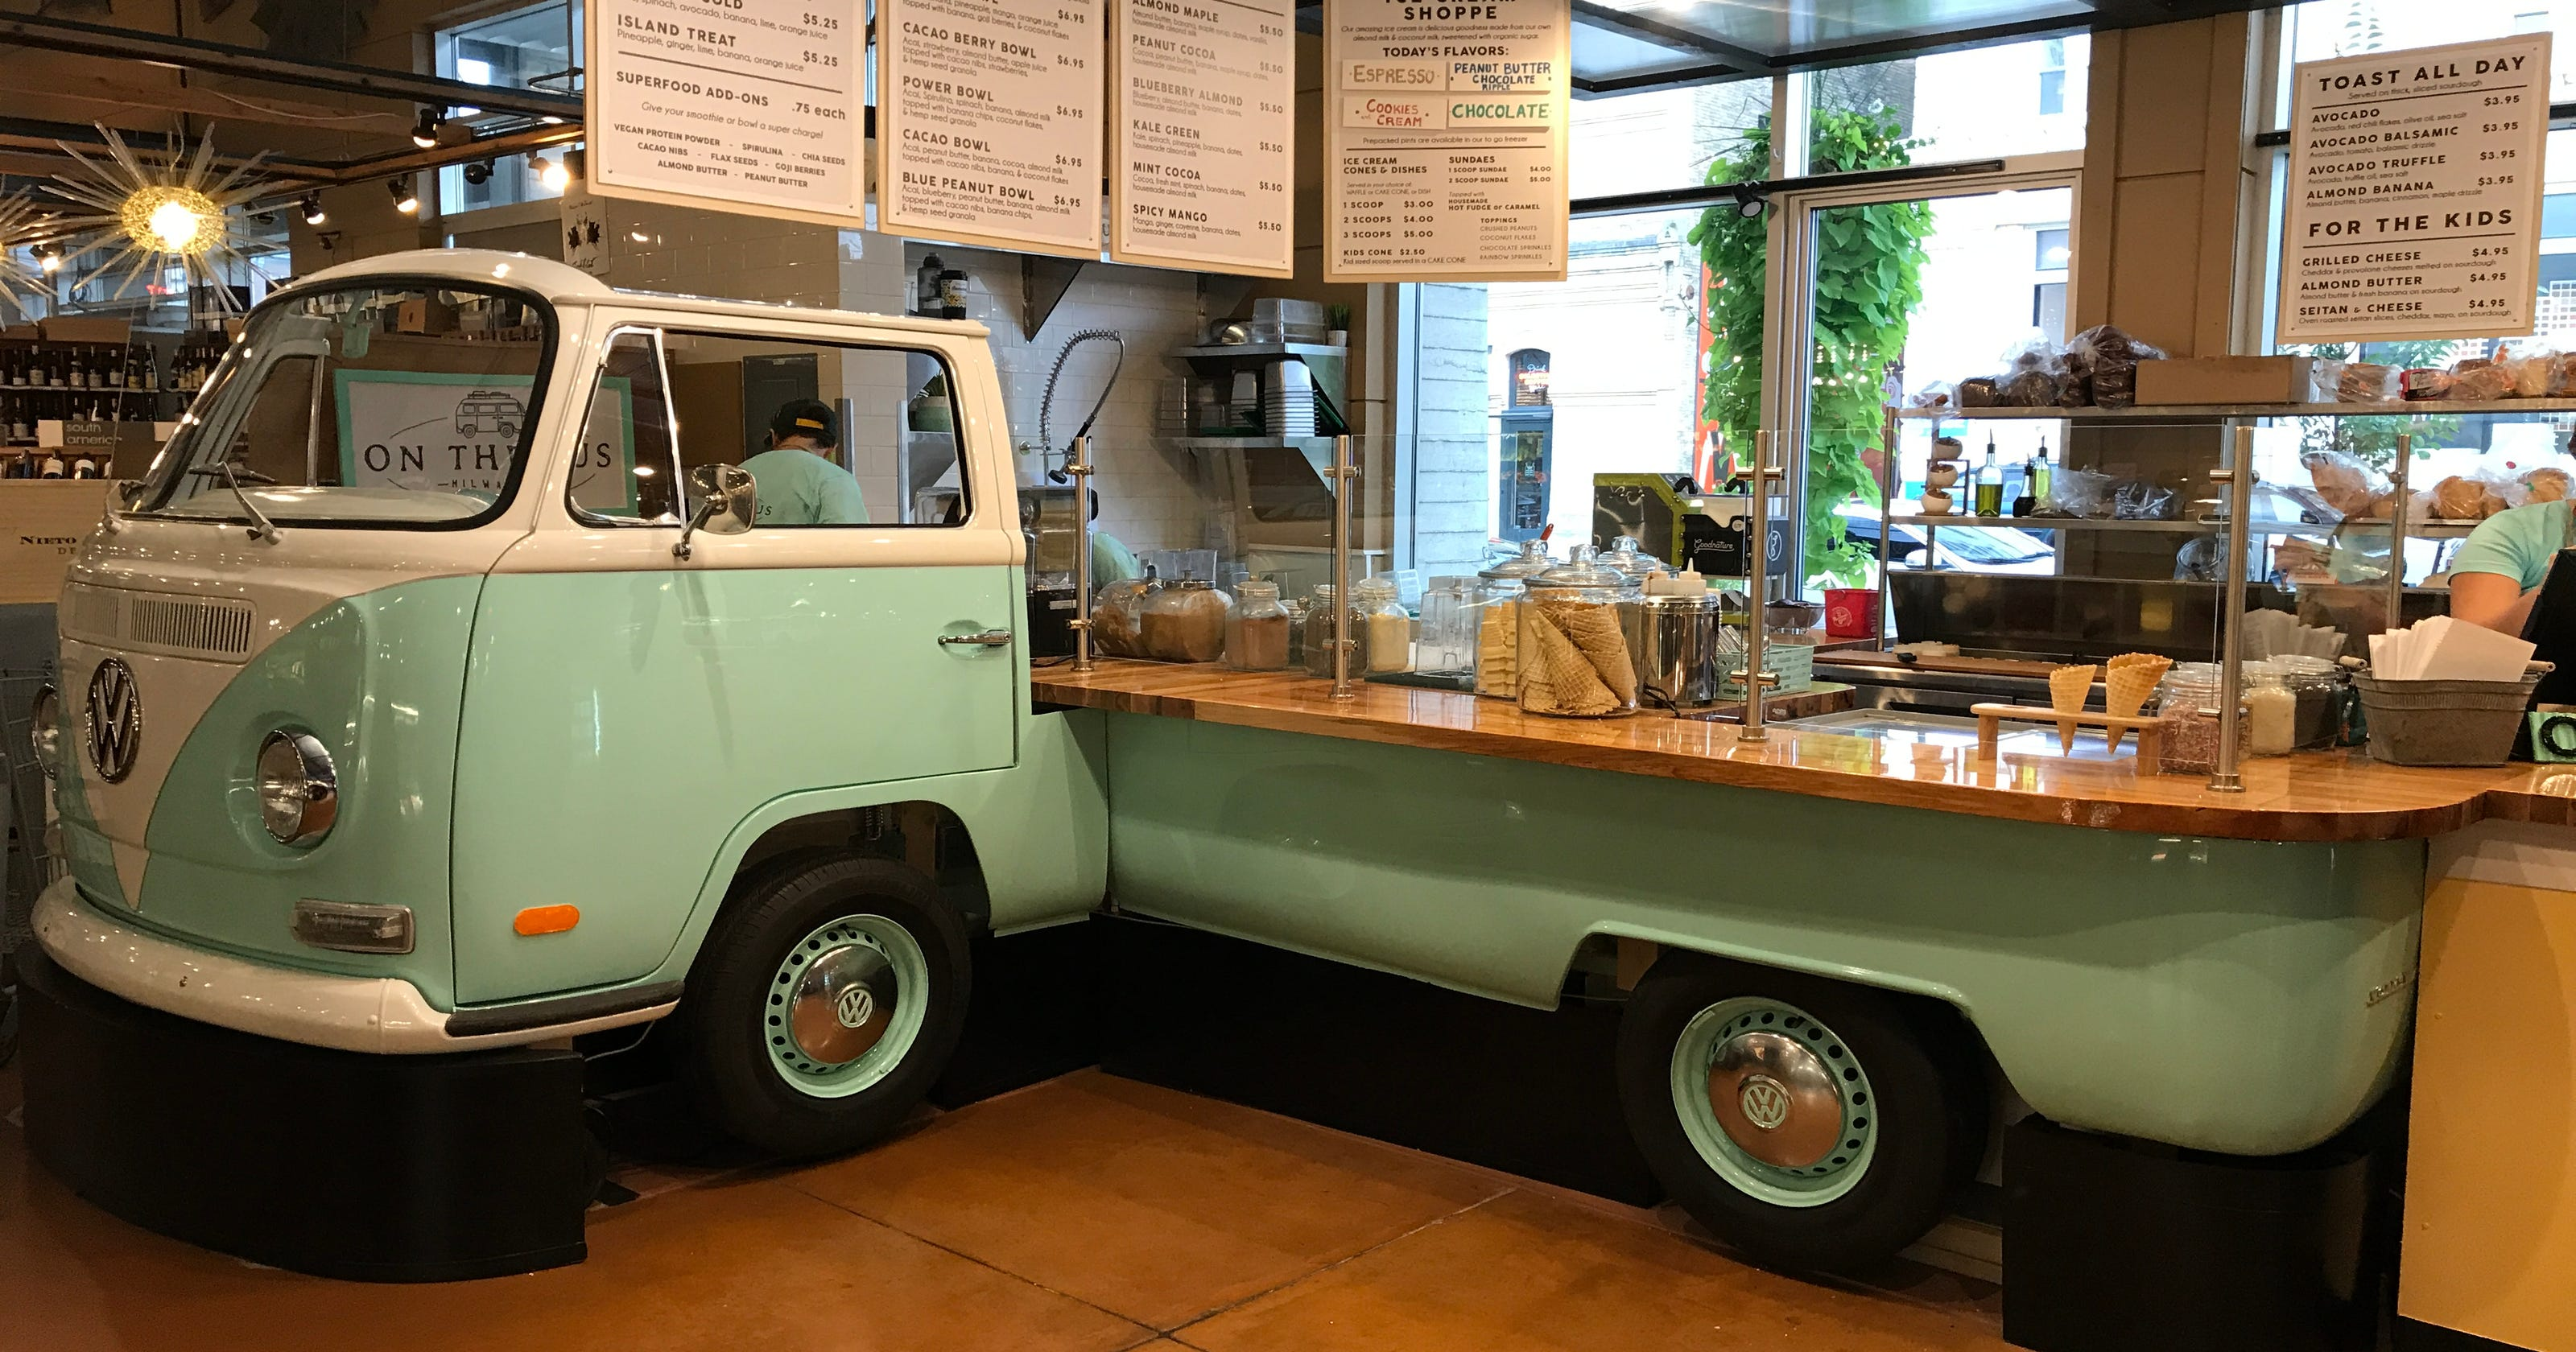 Milwaukee Public Market gets new vegan restaurant, On the Bus